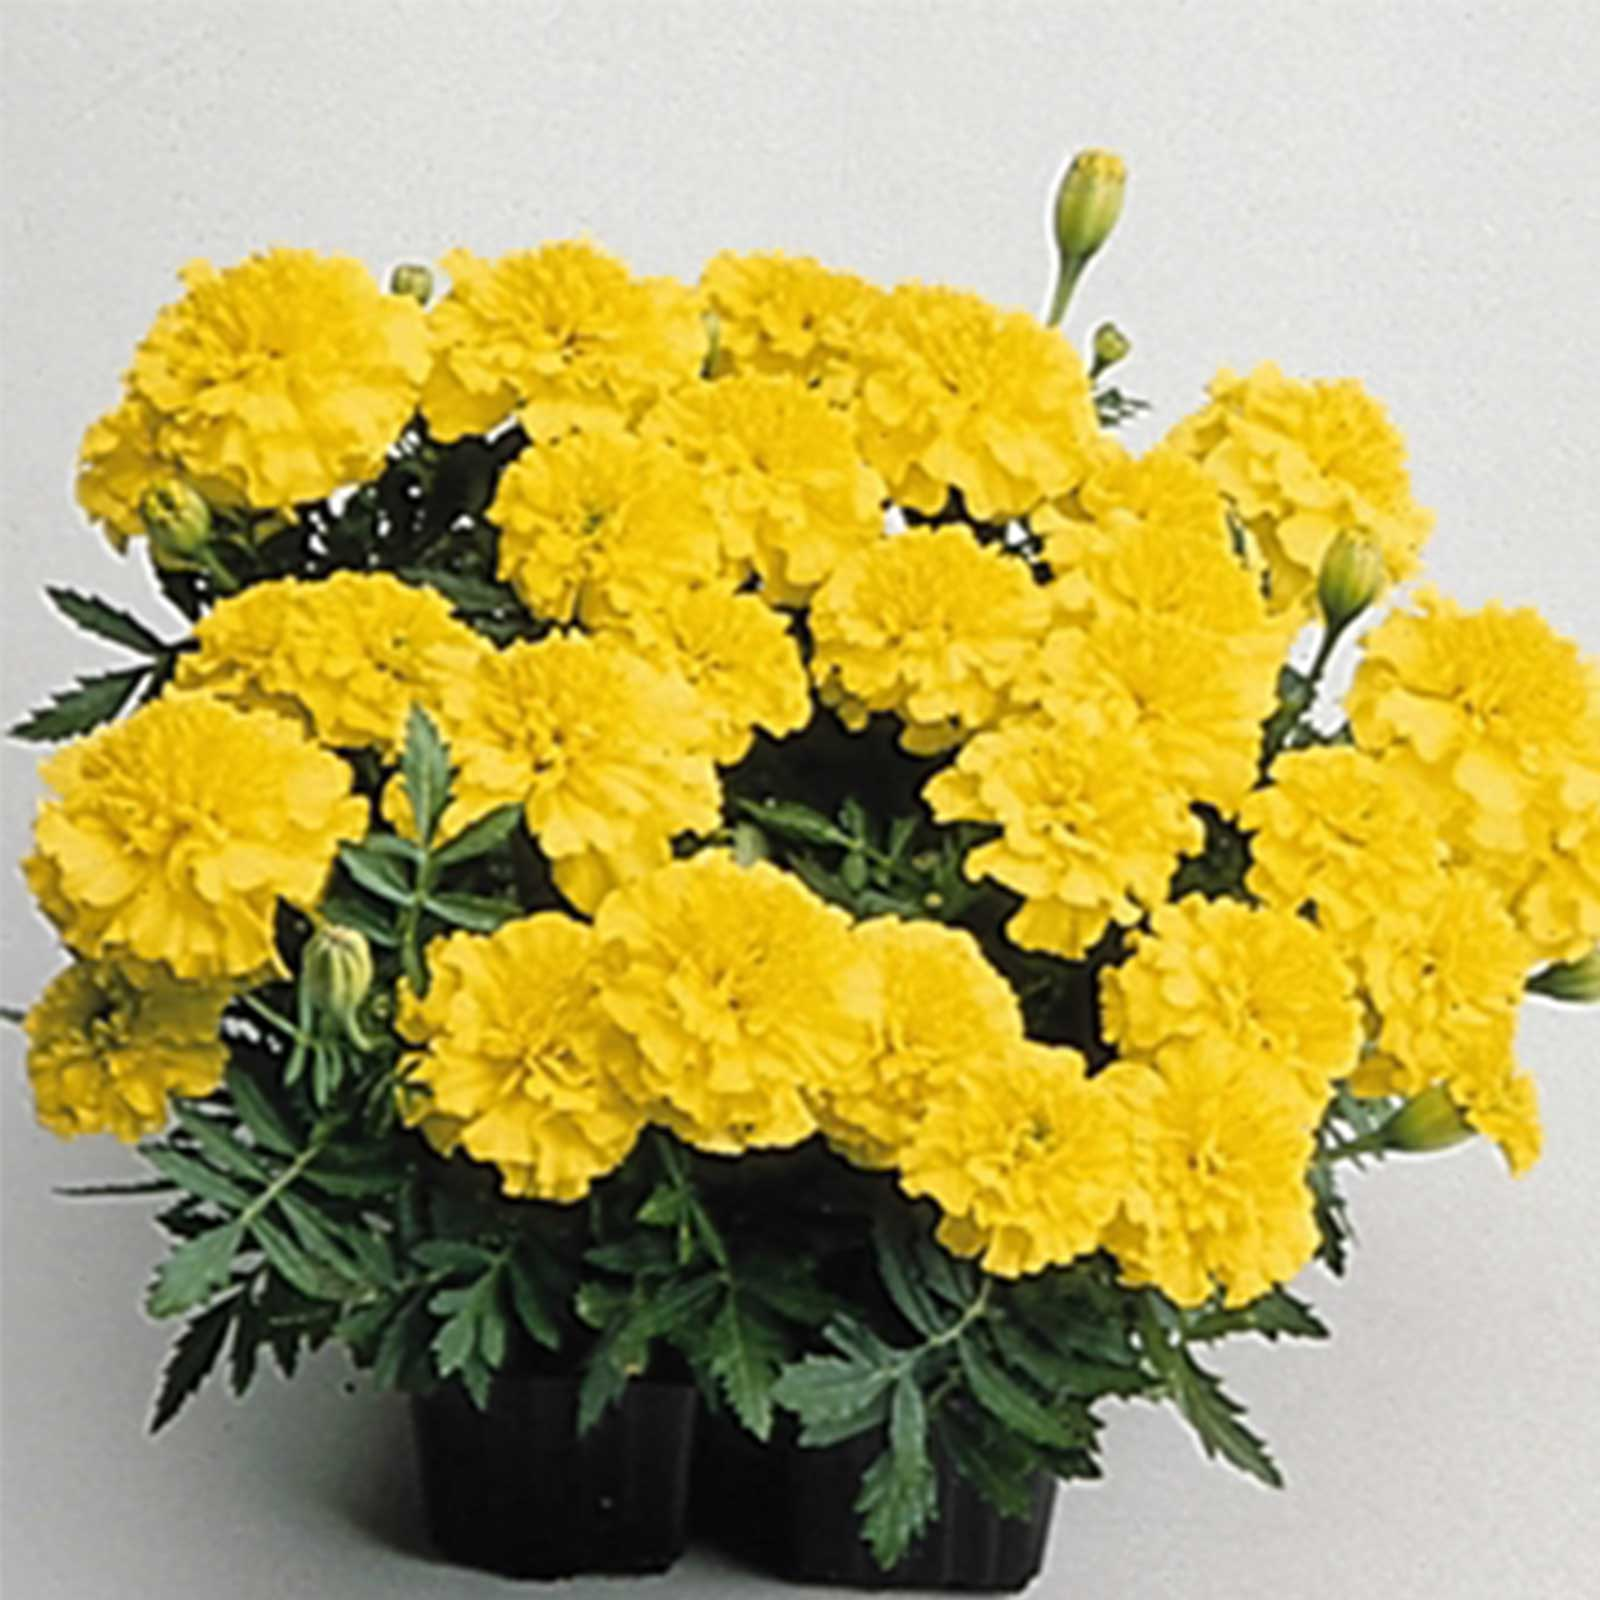 French Marigold Flower Garden Seeds - Janie Series - Bright Yellow - 1000 Seeds - Annual Flower Gardening Seeds - Tagetes patula